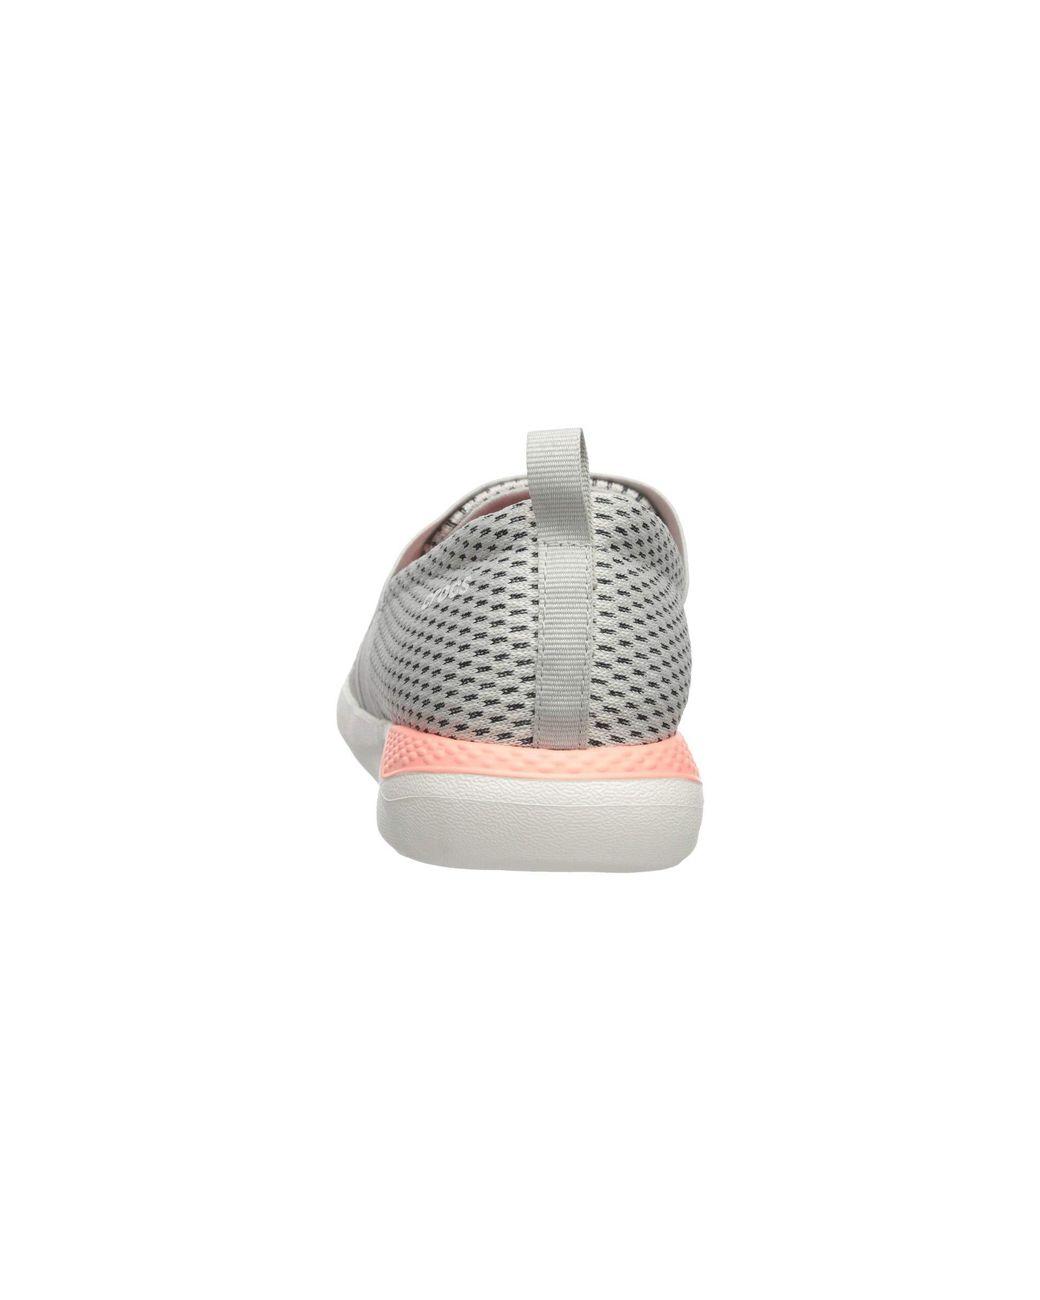 a5523d18030c Lyst - Crocs™ Literide Mesh Slip-on Sneaker in White - Save 29%